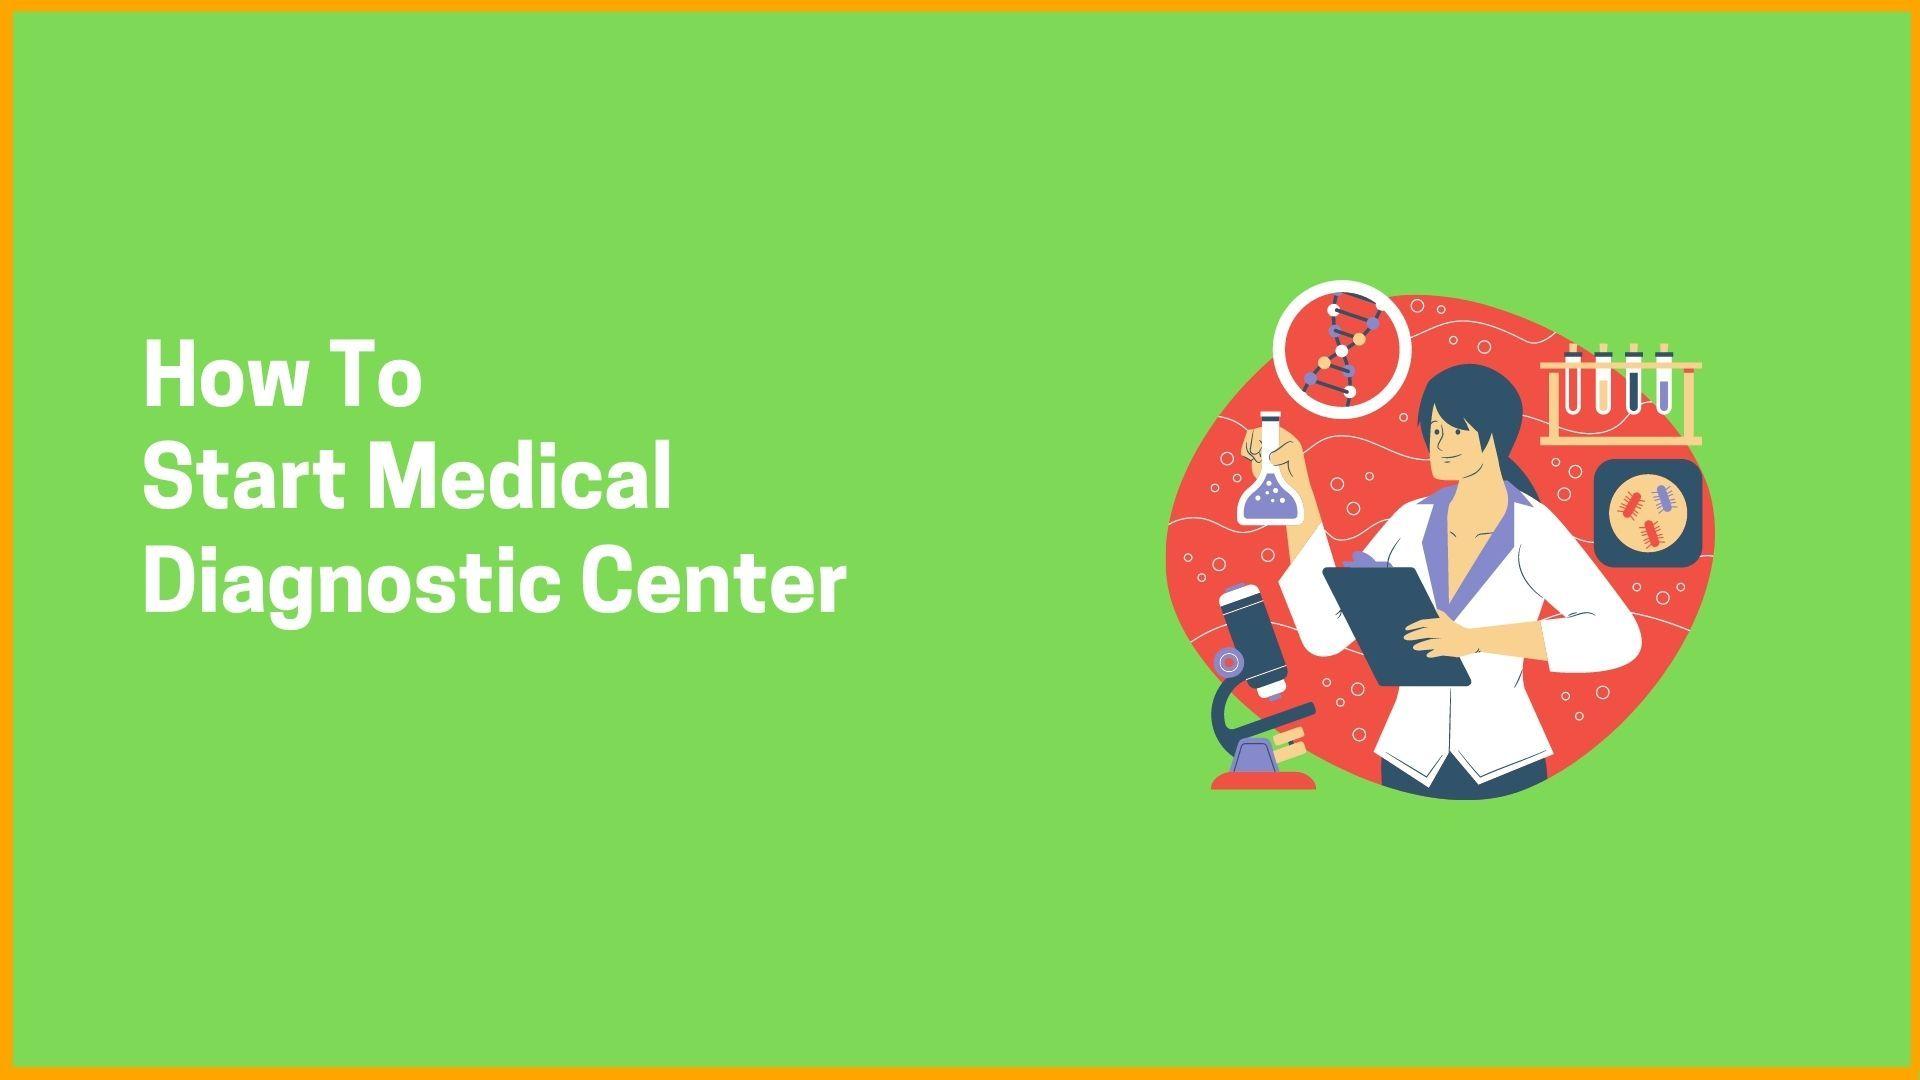 How To Start Medical Diagnostic Center